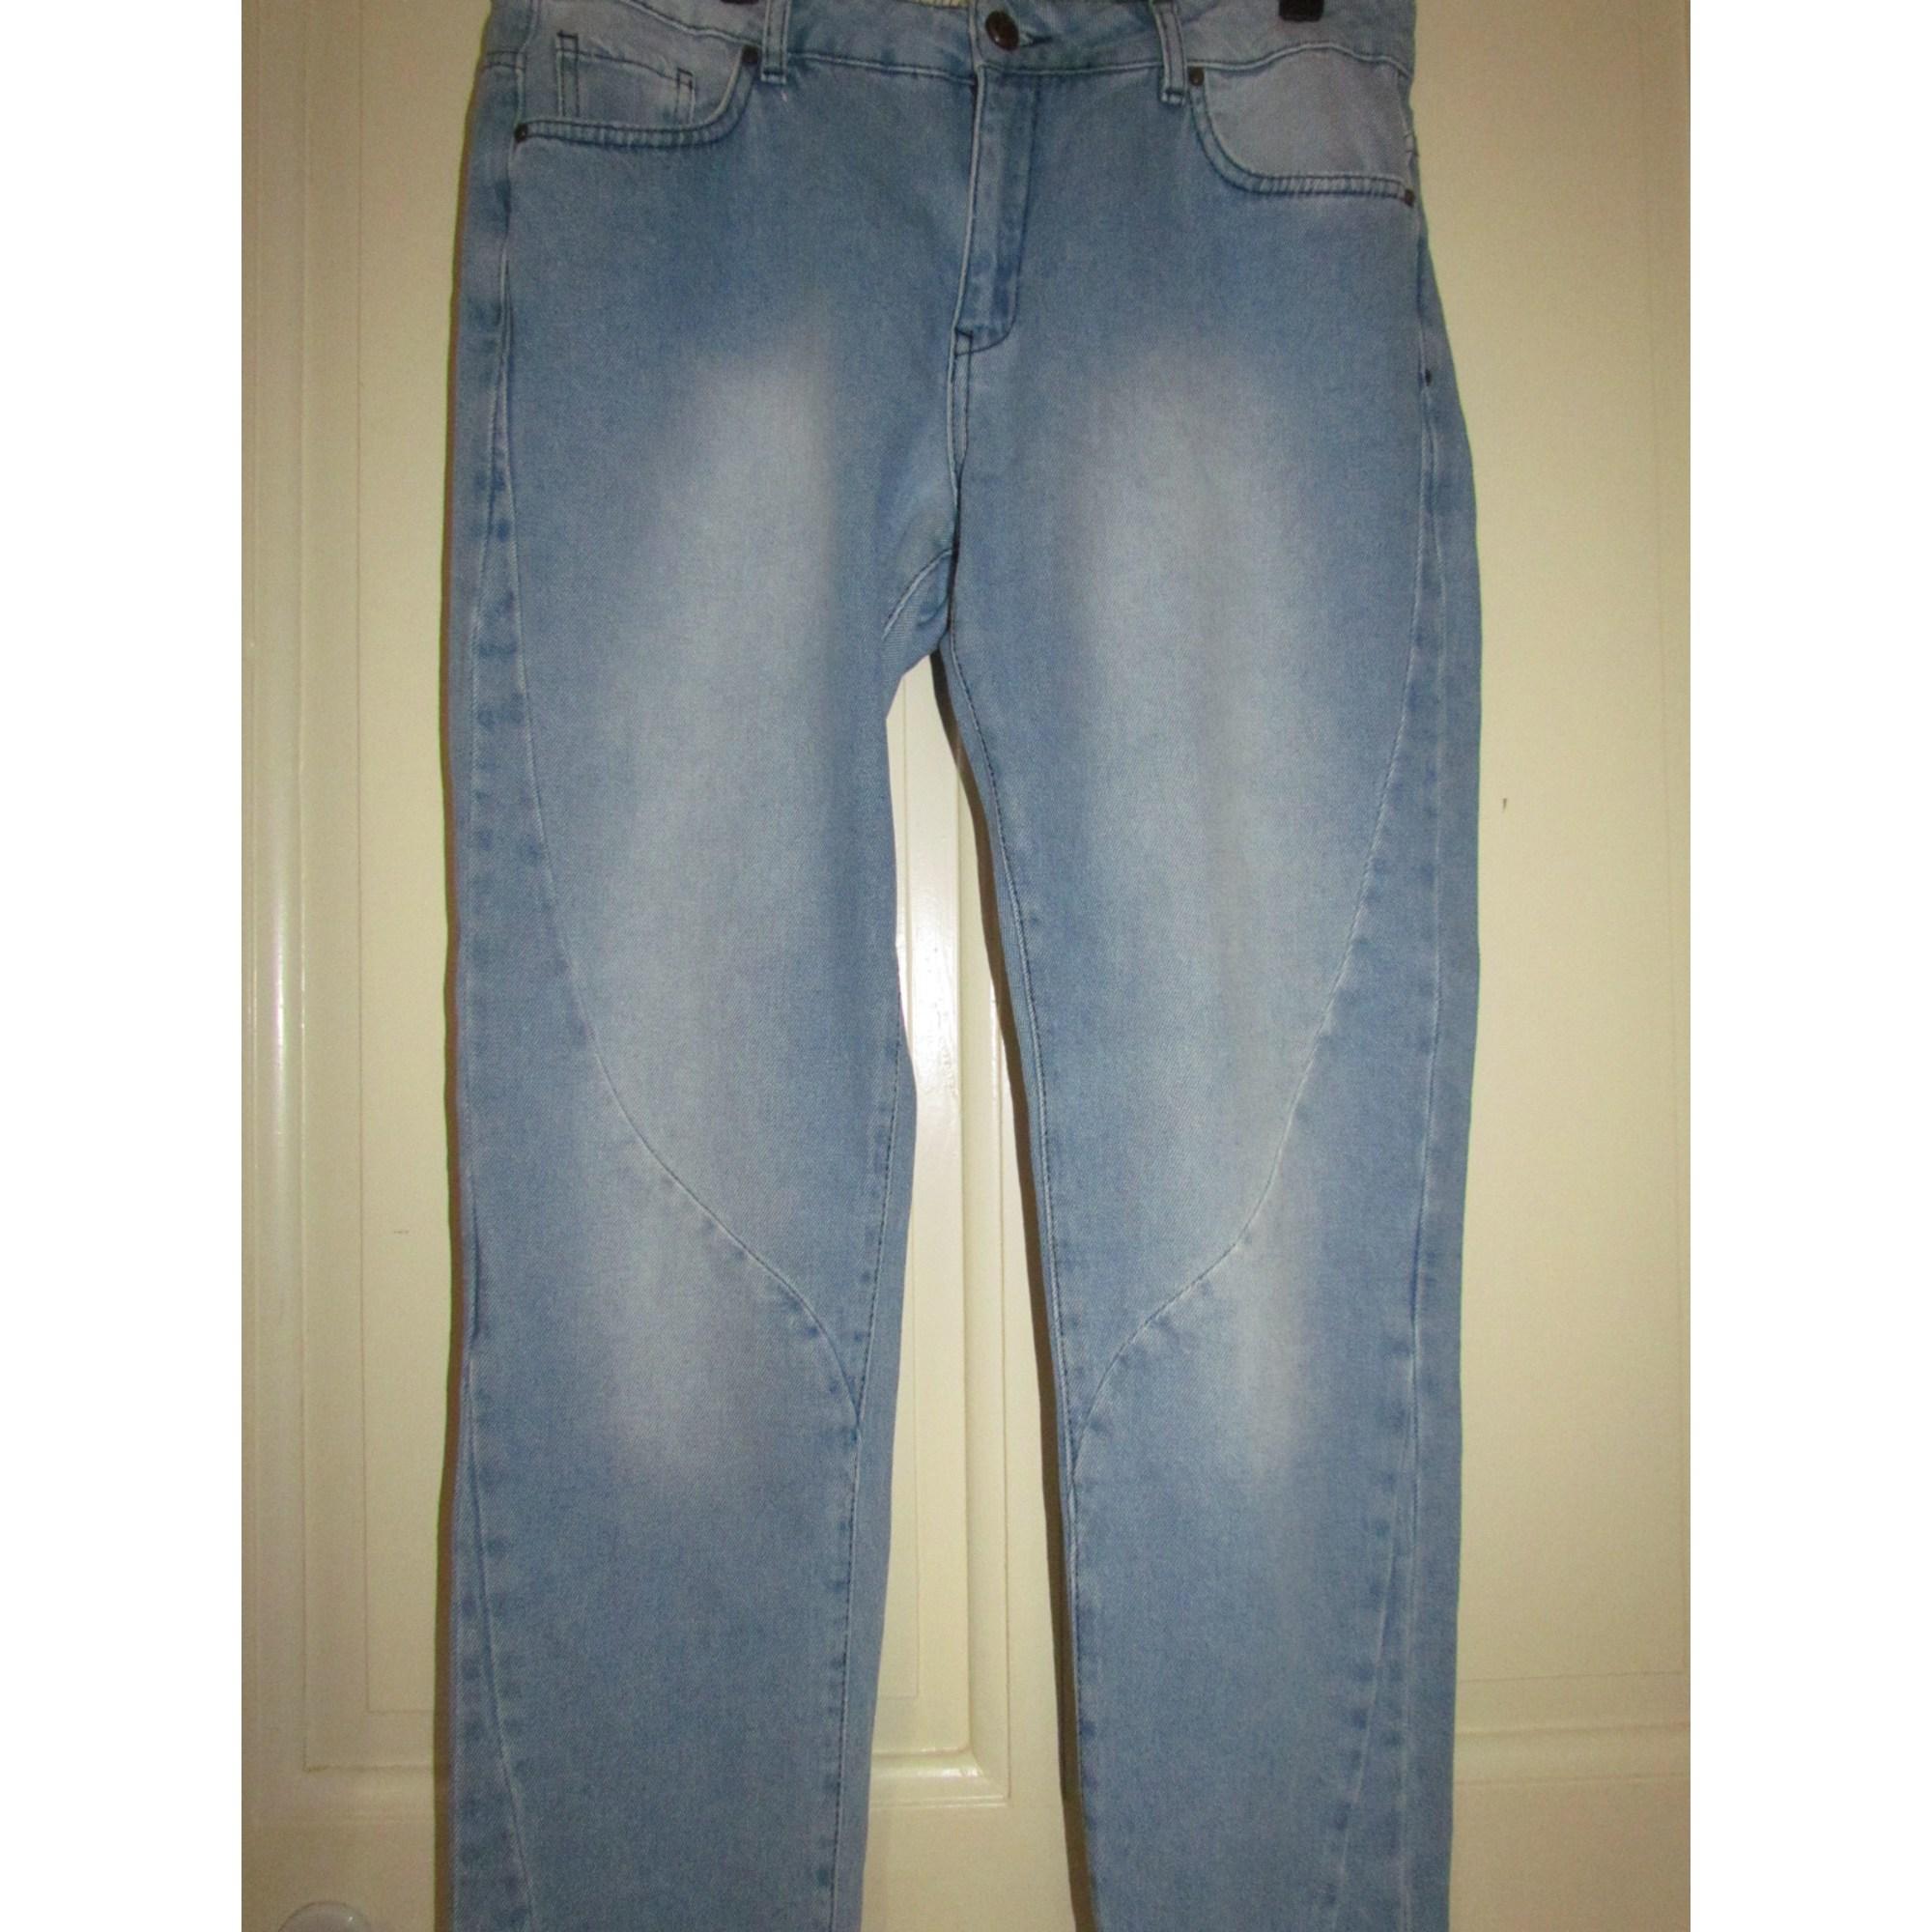 Jeans droit COTÉLAC Bleu, bleu marine, bleu turquoise